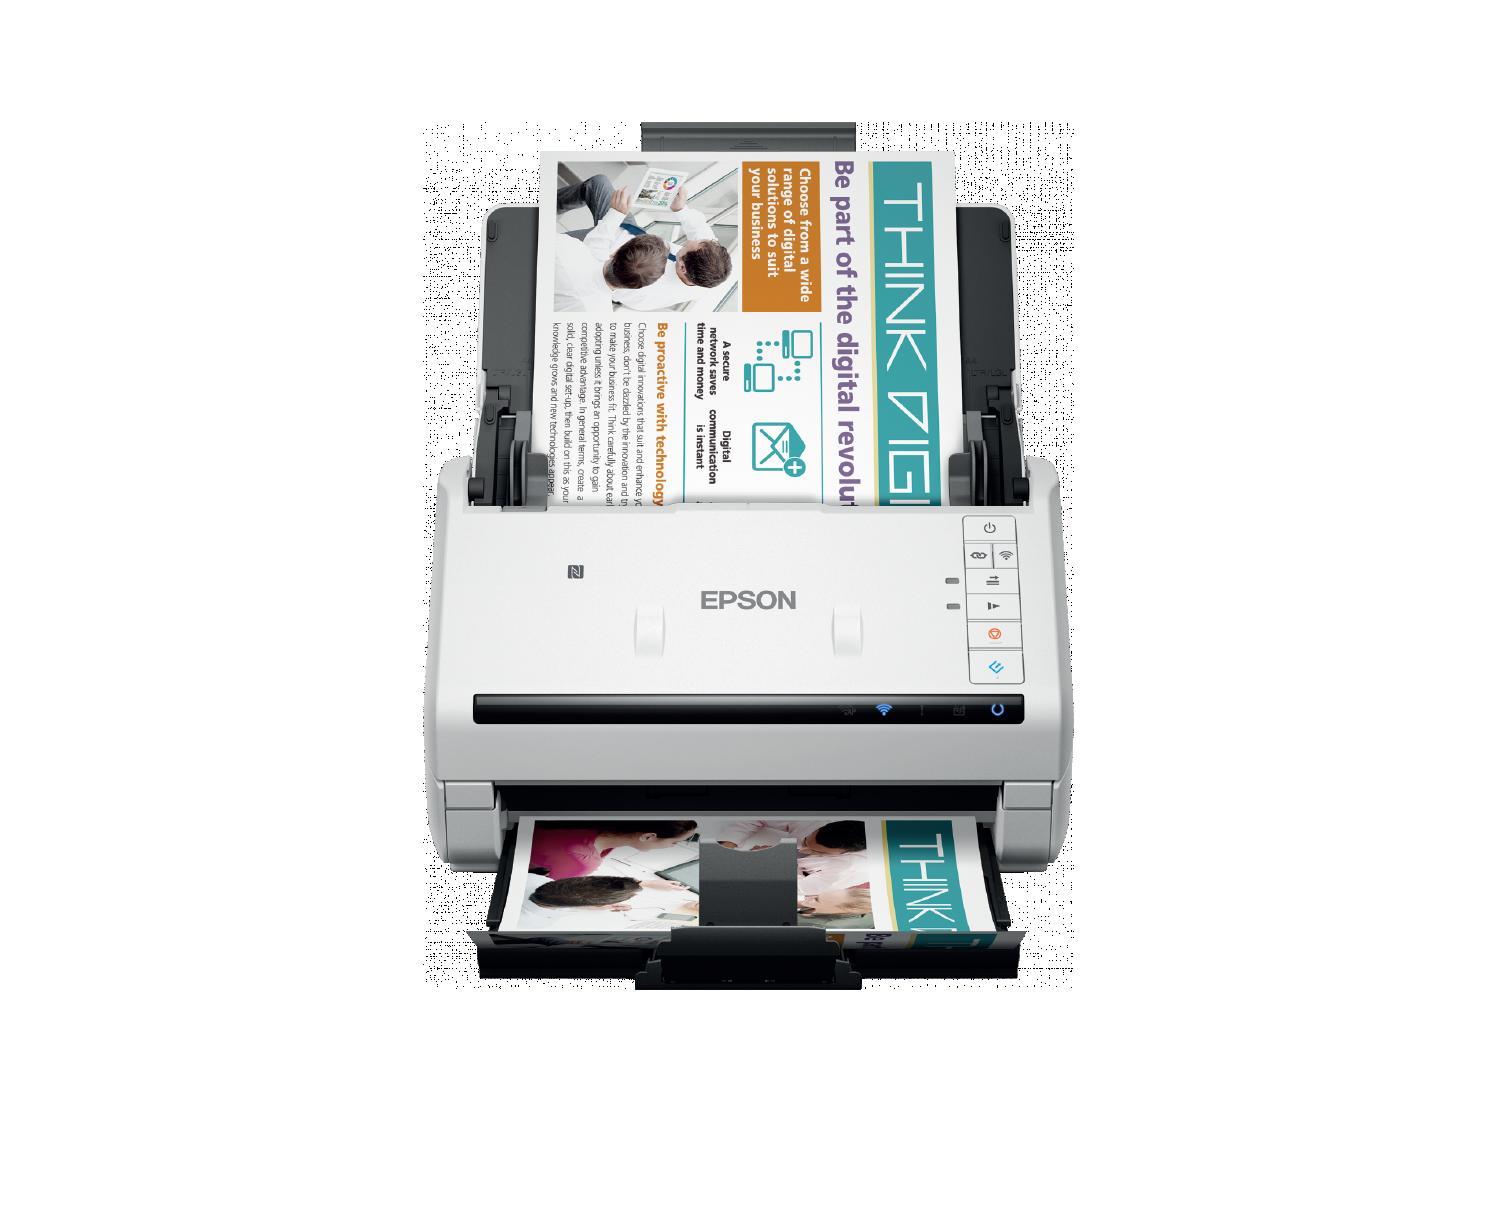 Epson DS570W